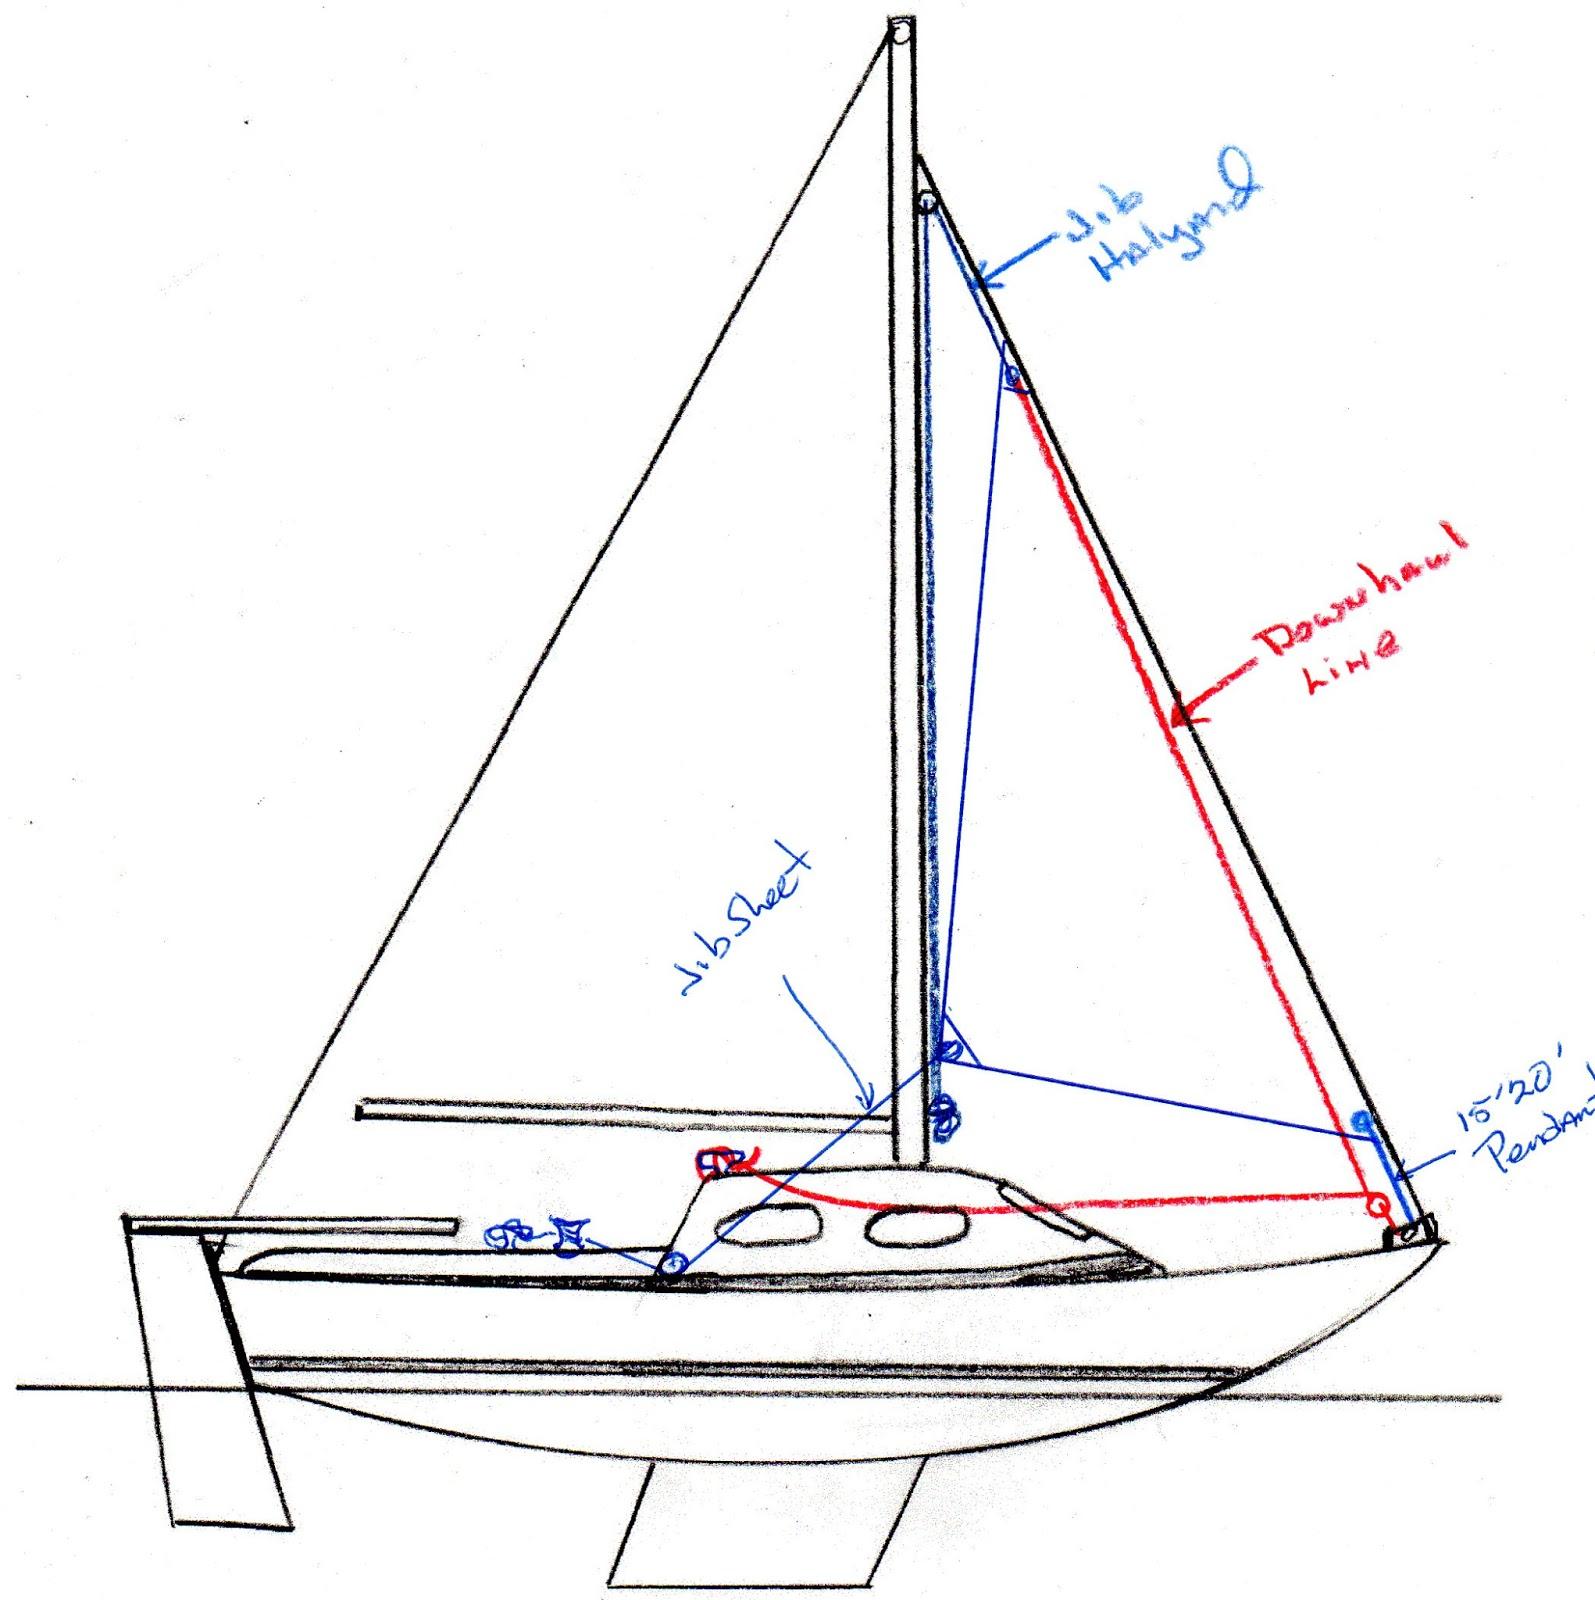 Boat Anatomy Diagram Bmw E30 M40 Wiring Jib Rigging Mast Elsavadorla